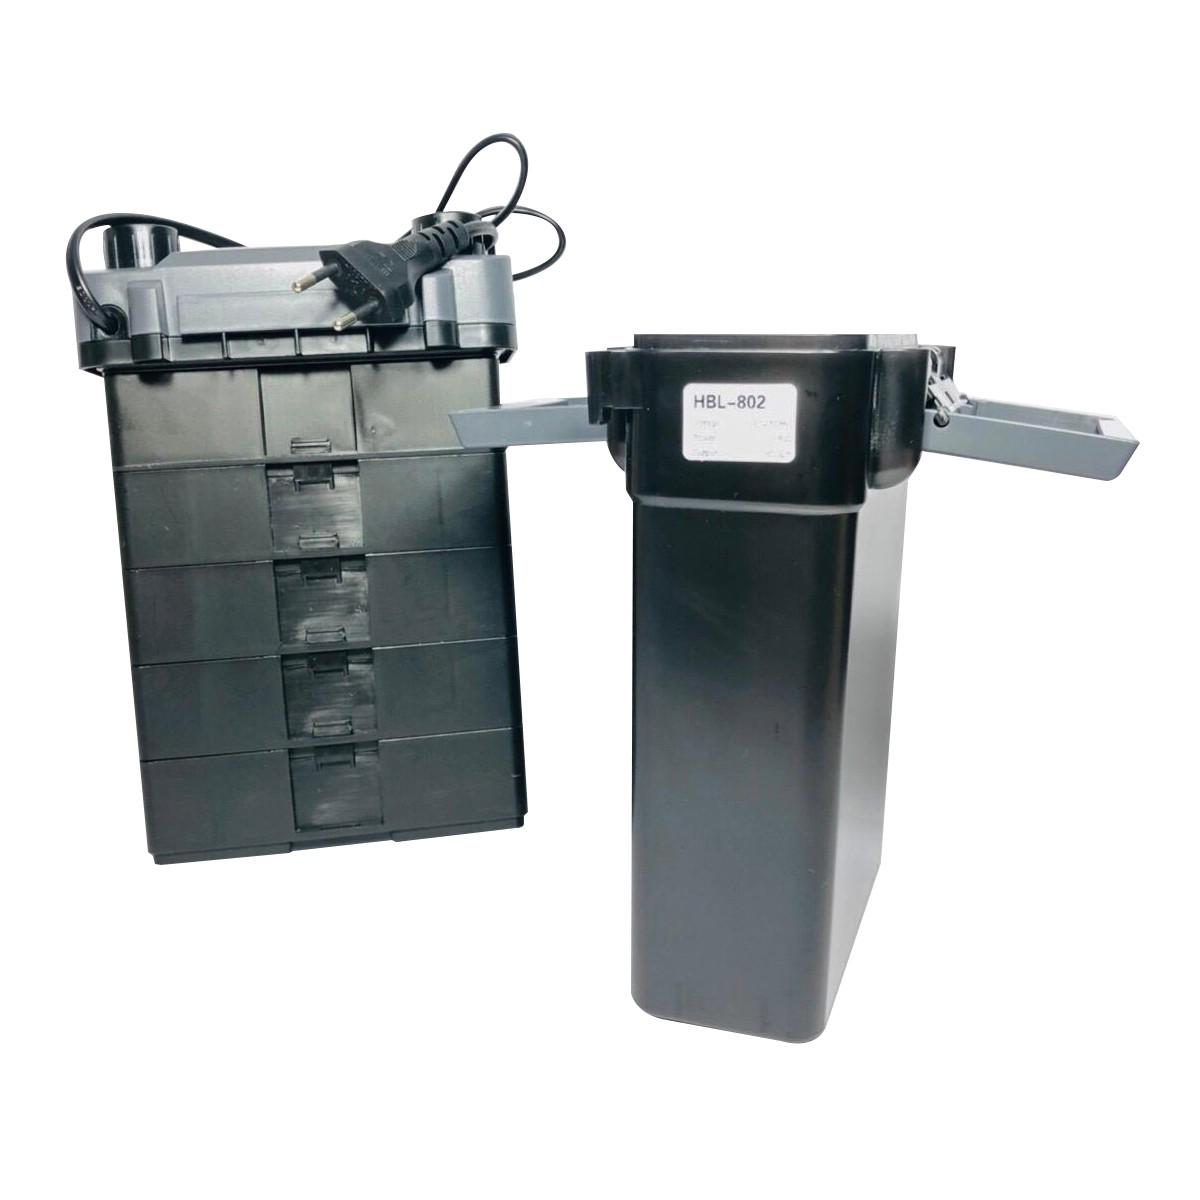 Filtro Externo Hang On Sunsun Hbl-801 500l/h Aquário